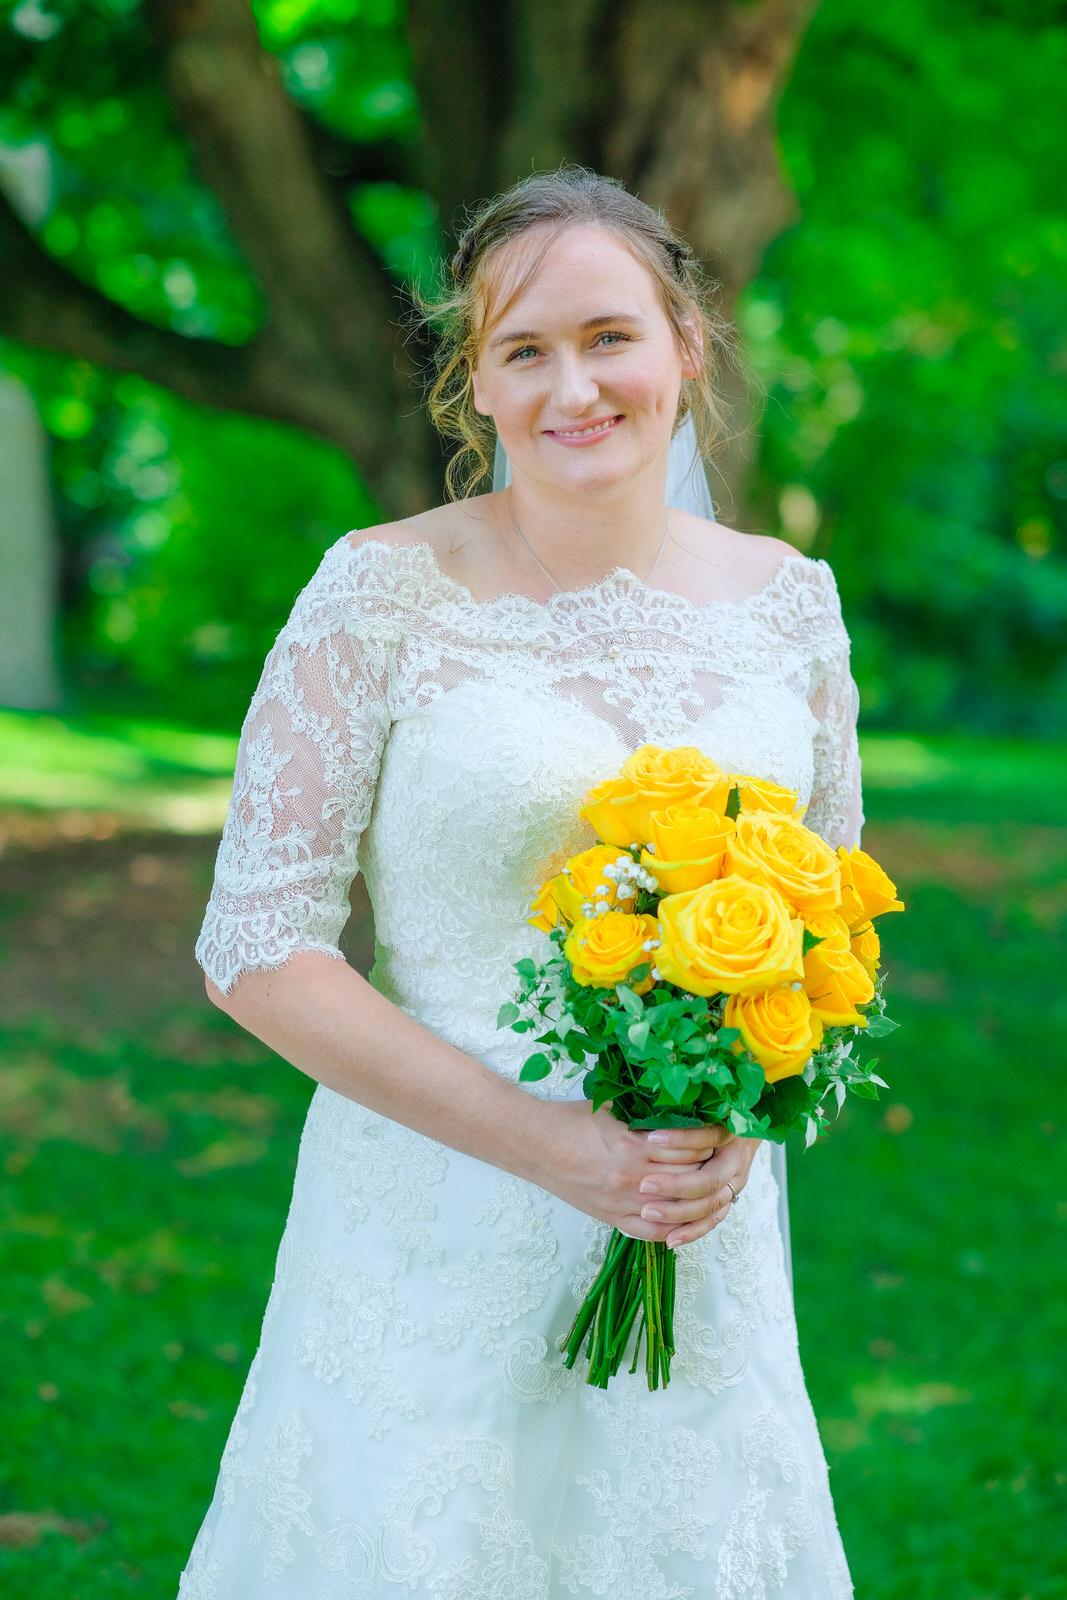 candid-vermont-wedding-photography-440.jpg